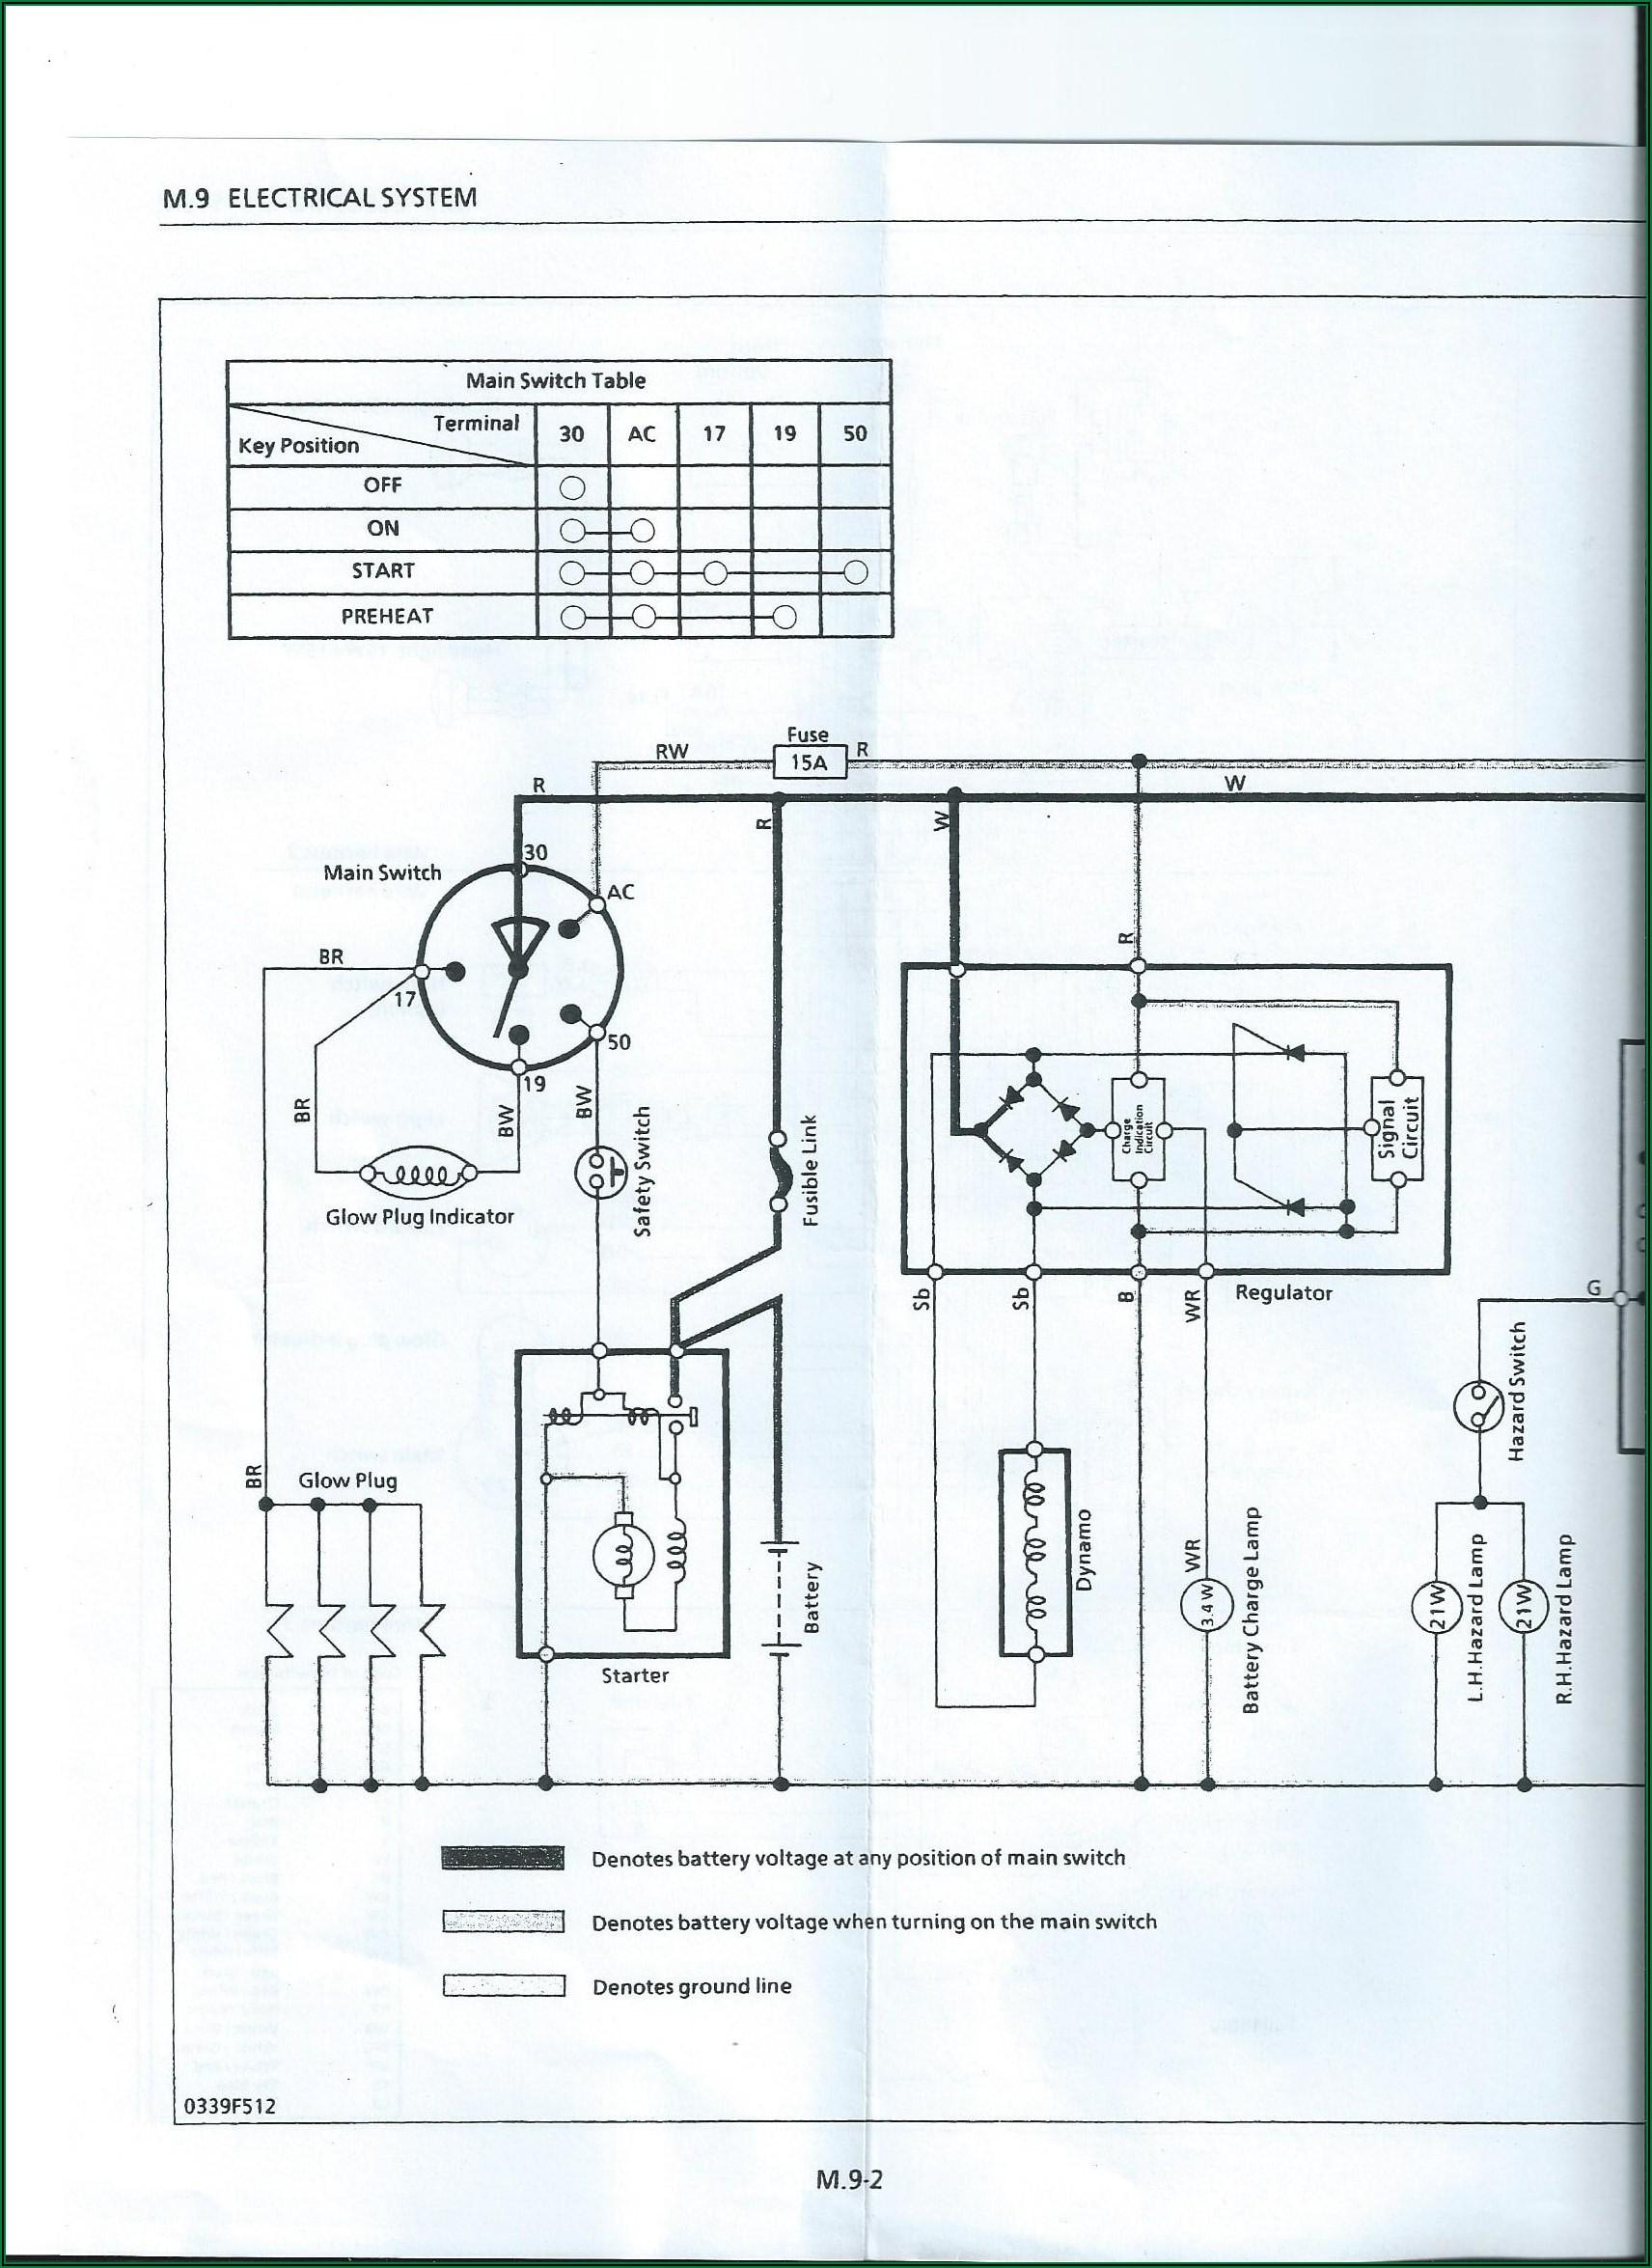 Ford 8n 12 Volt Electrical Diagram